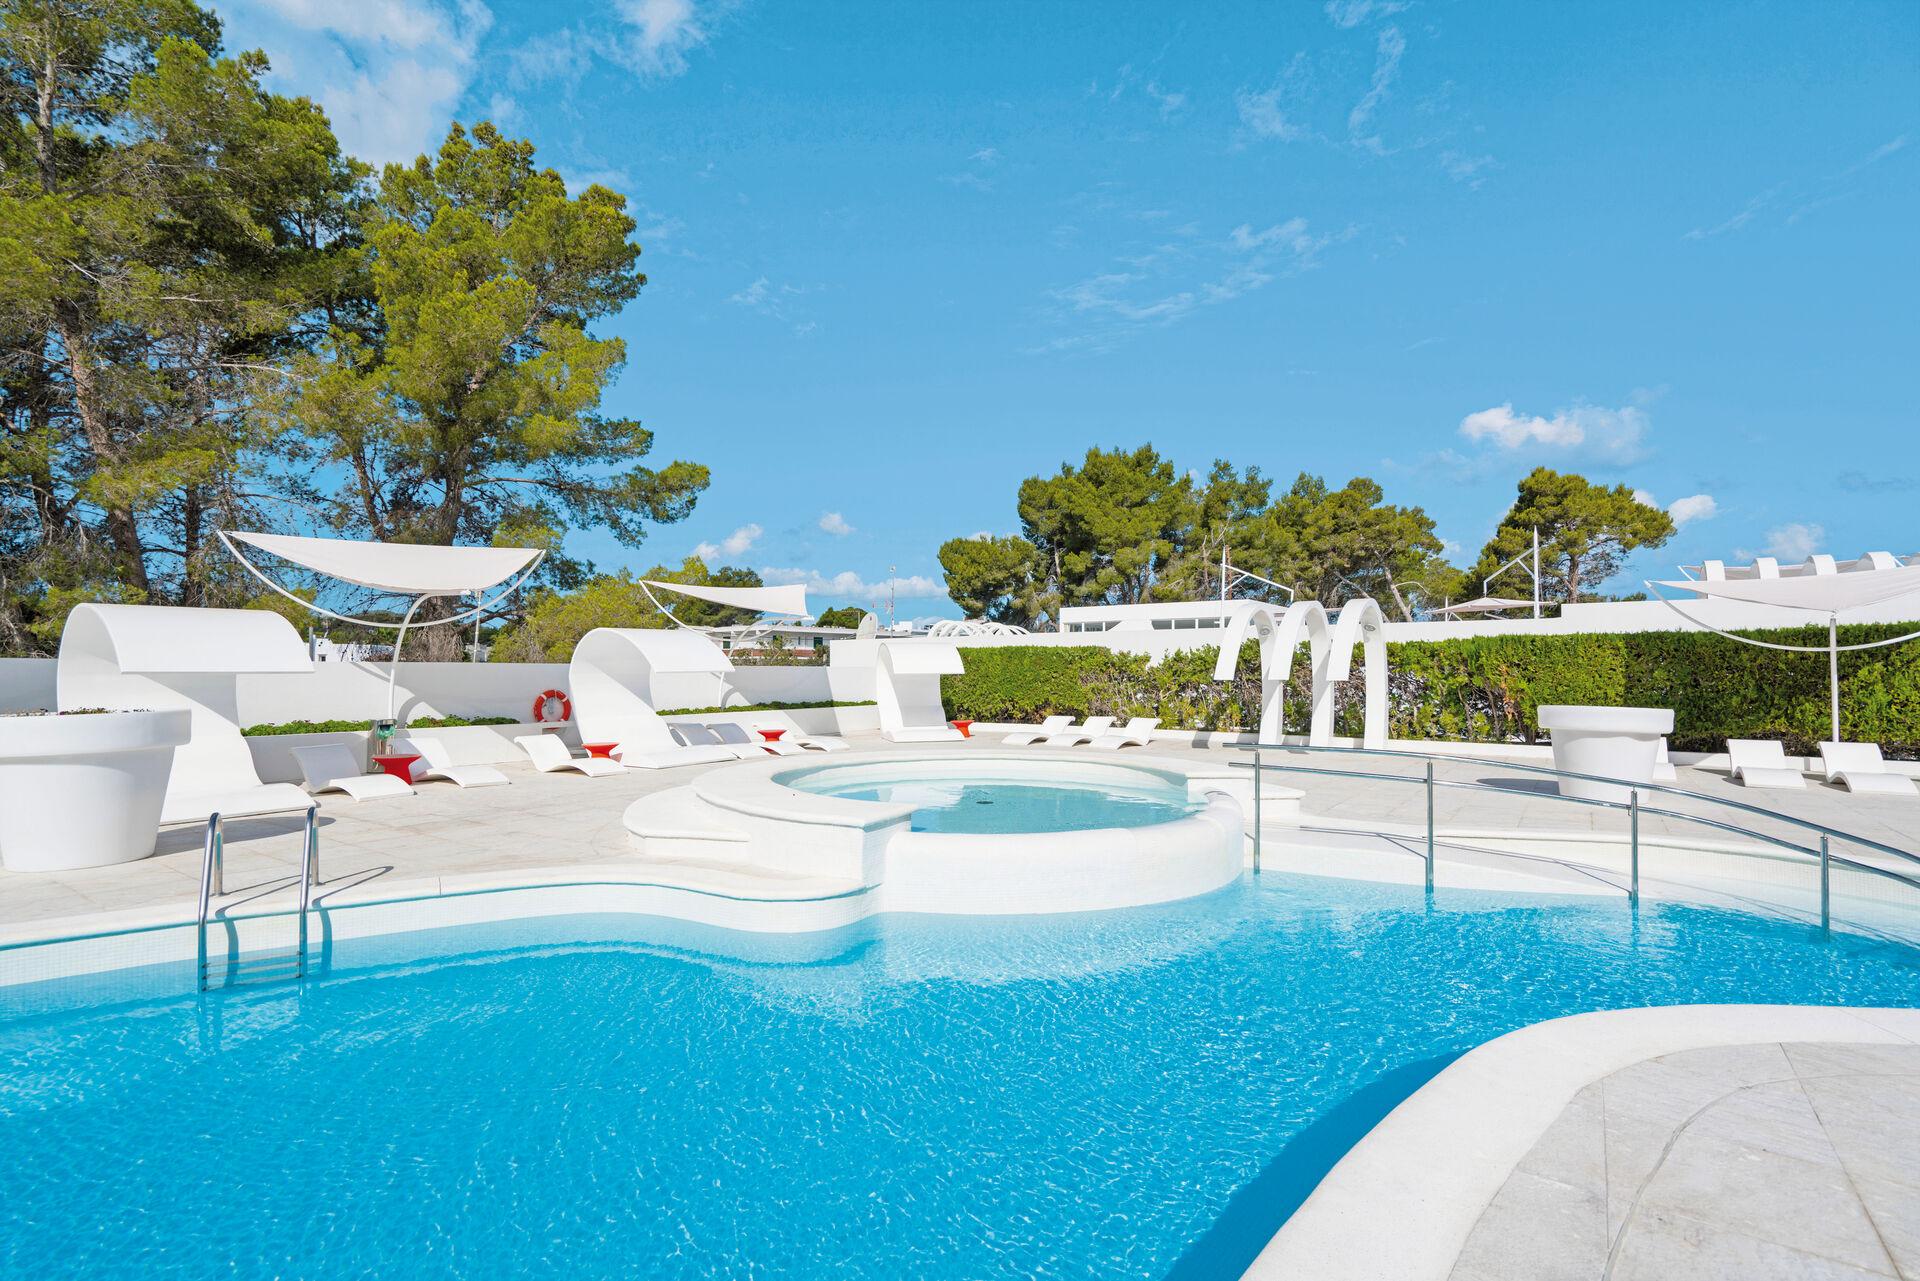 Séjour Espagne - Hotel THB Naeco Ibiza Class - 4*